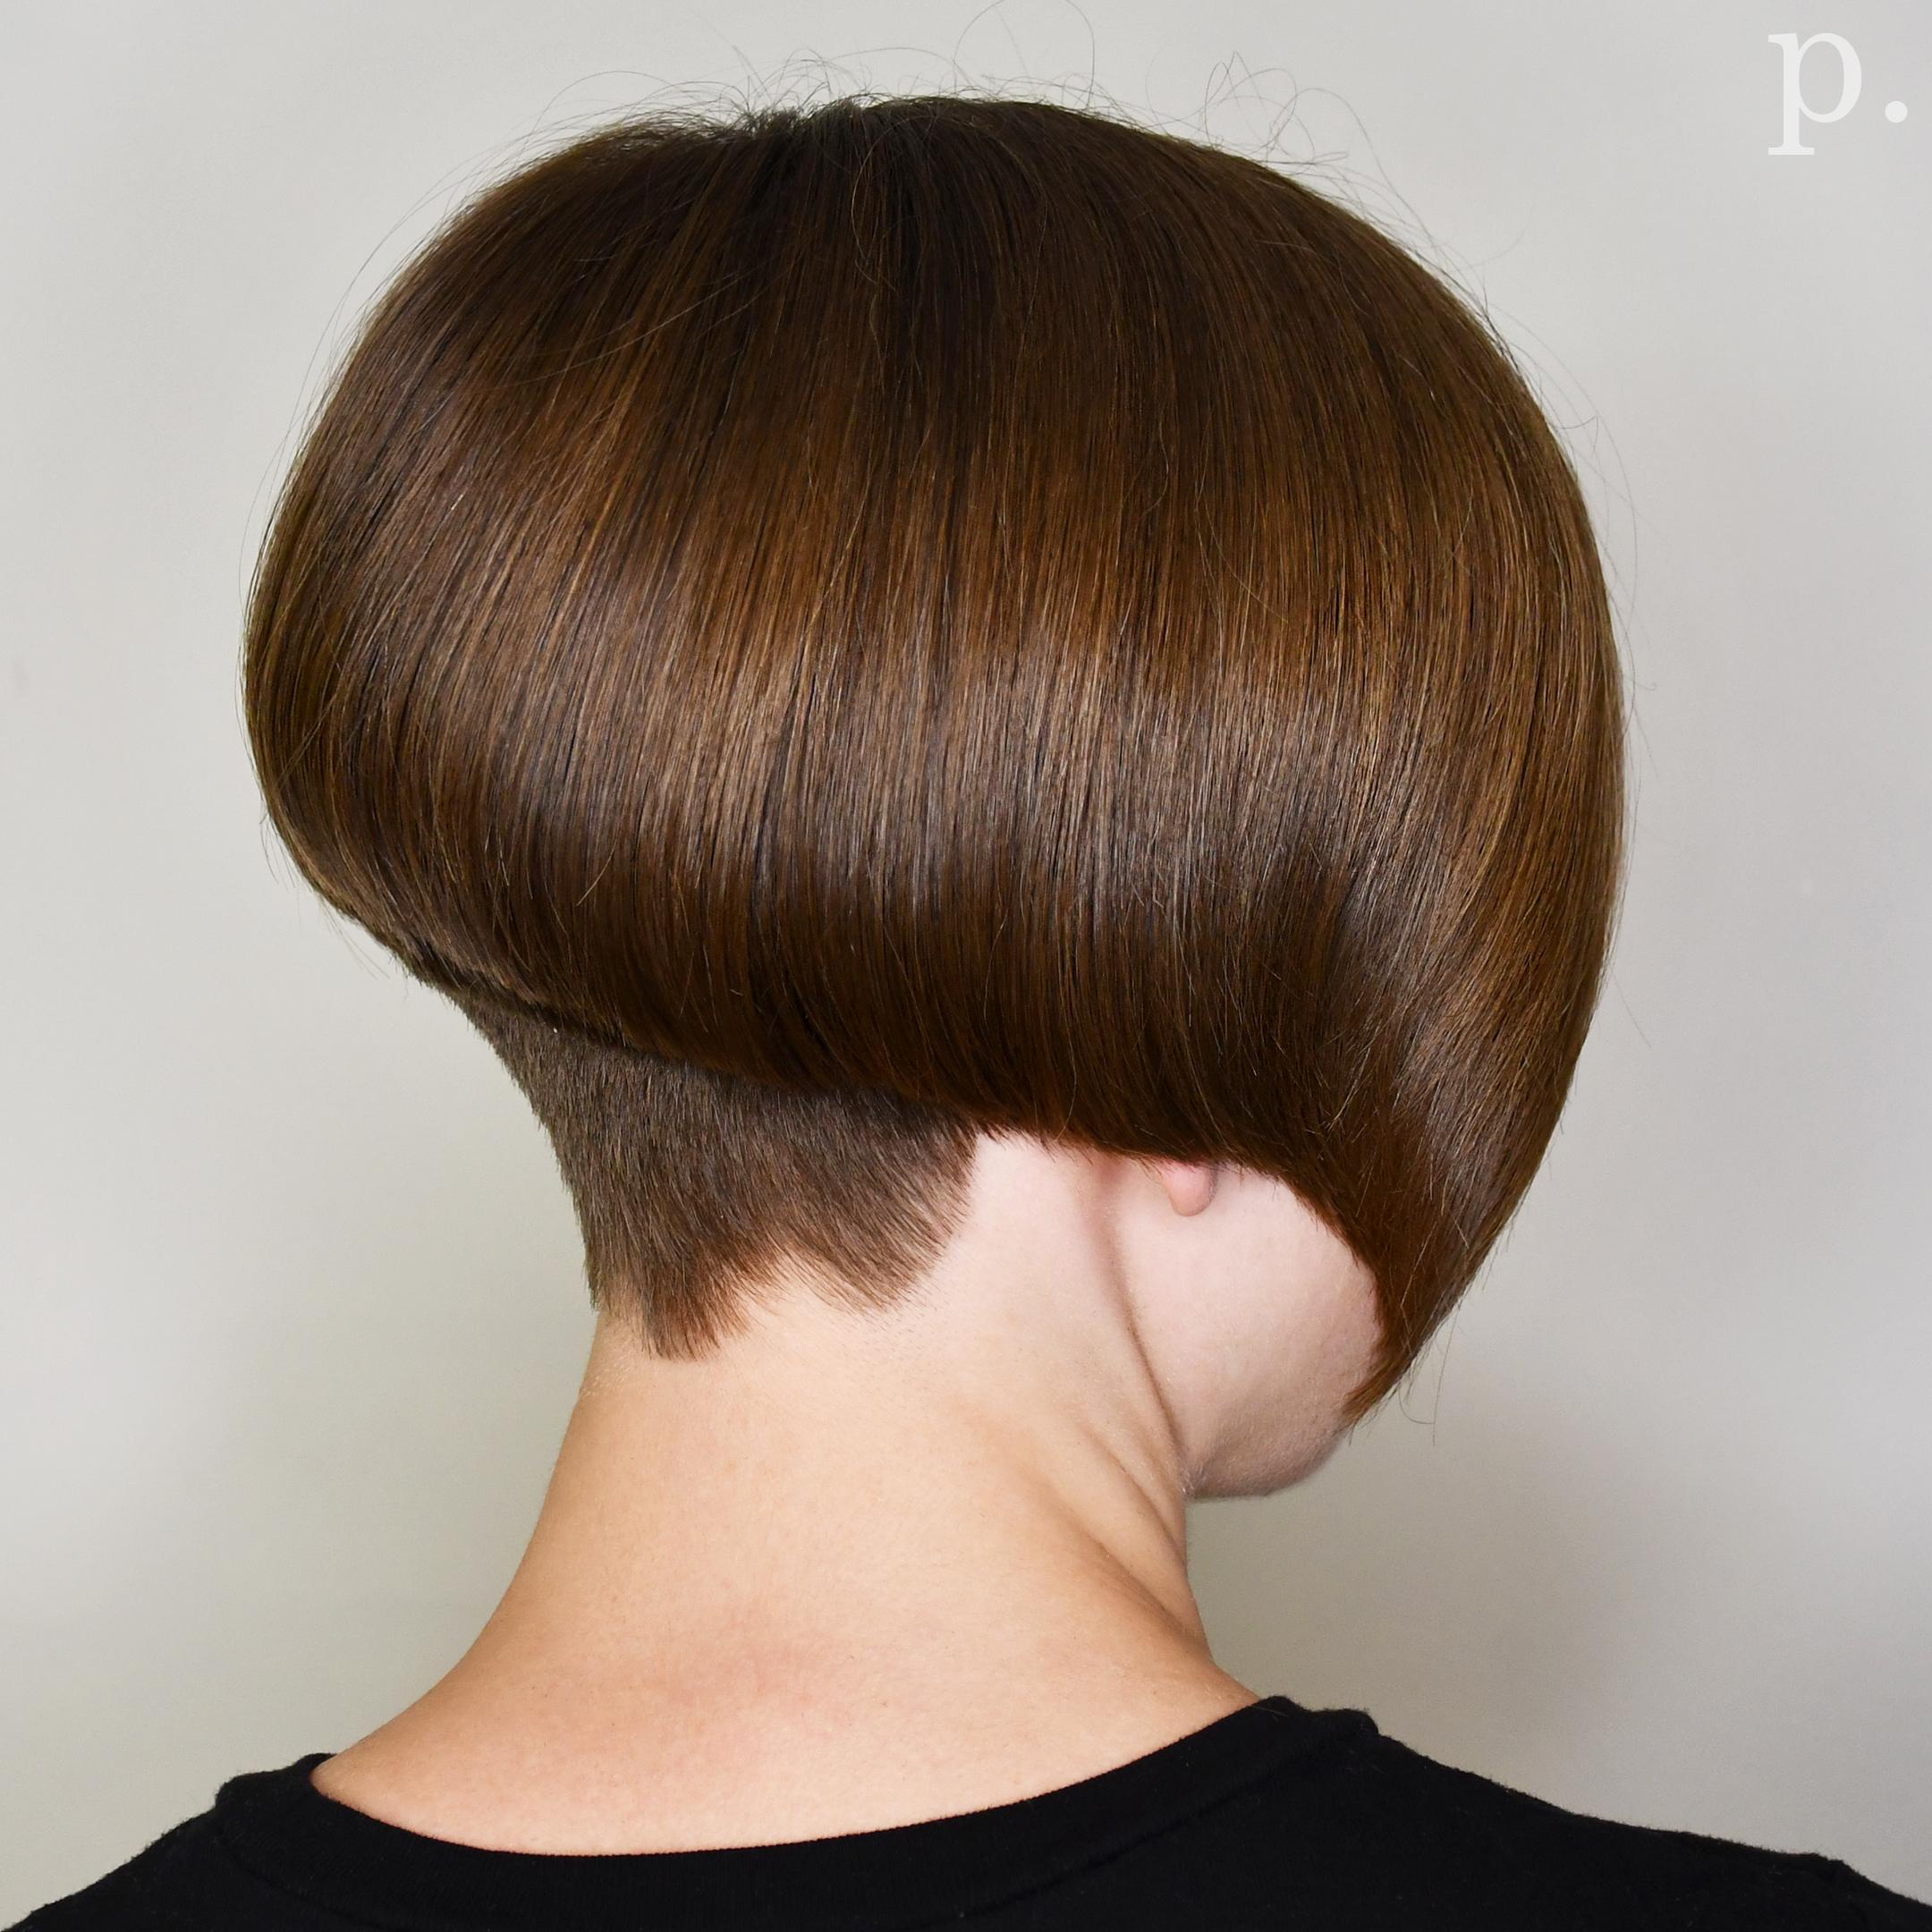 short_haircut_stephanie.jpg